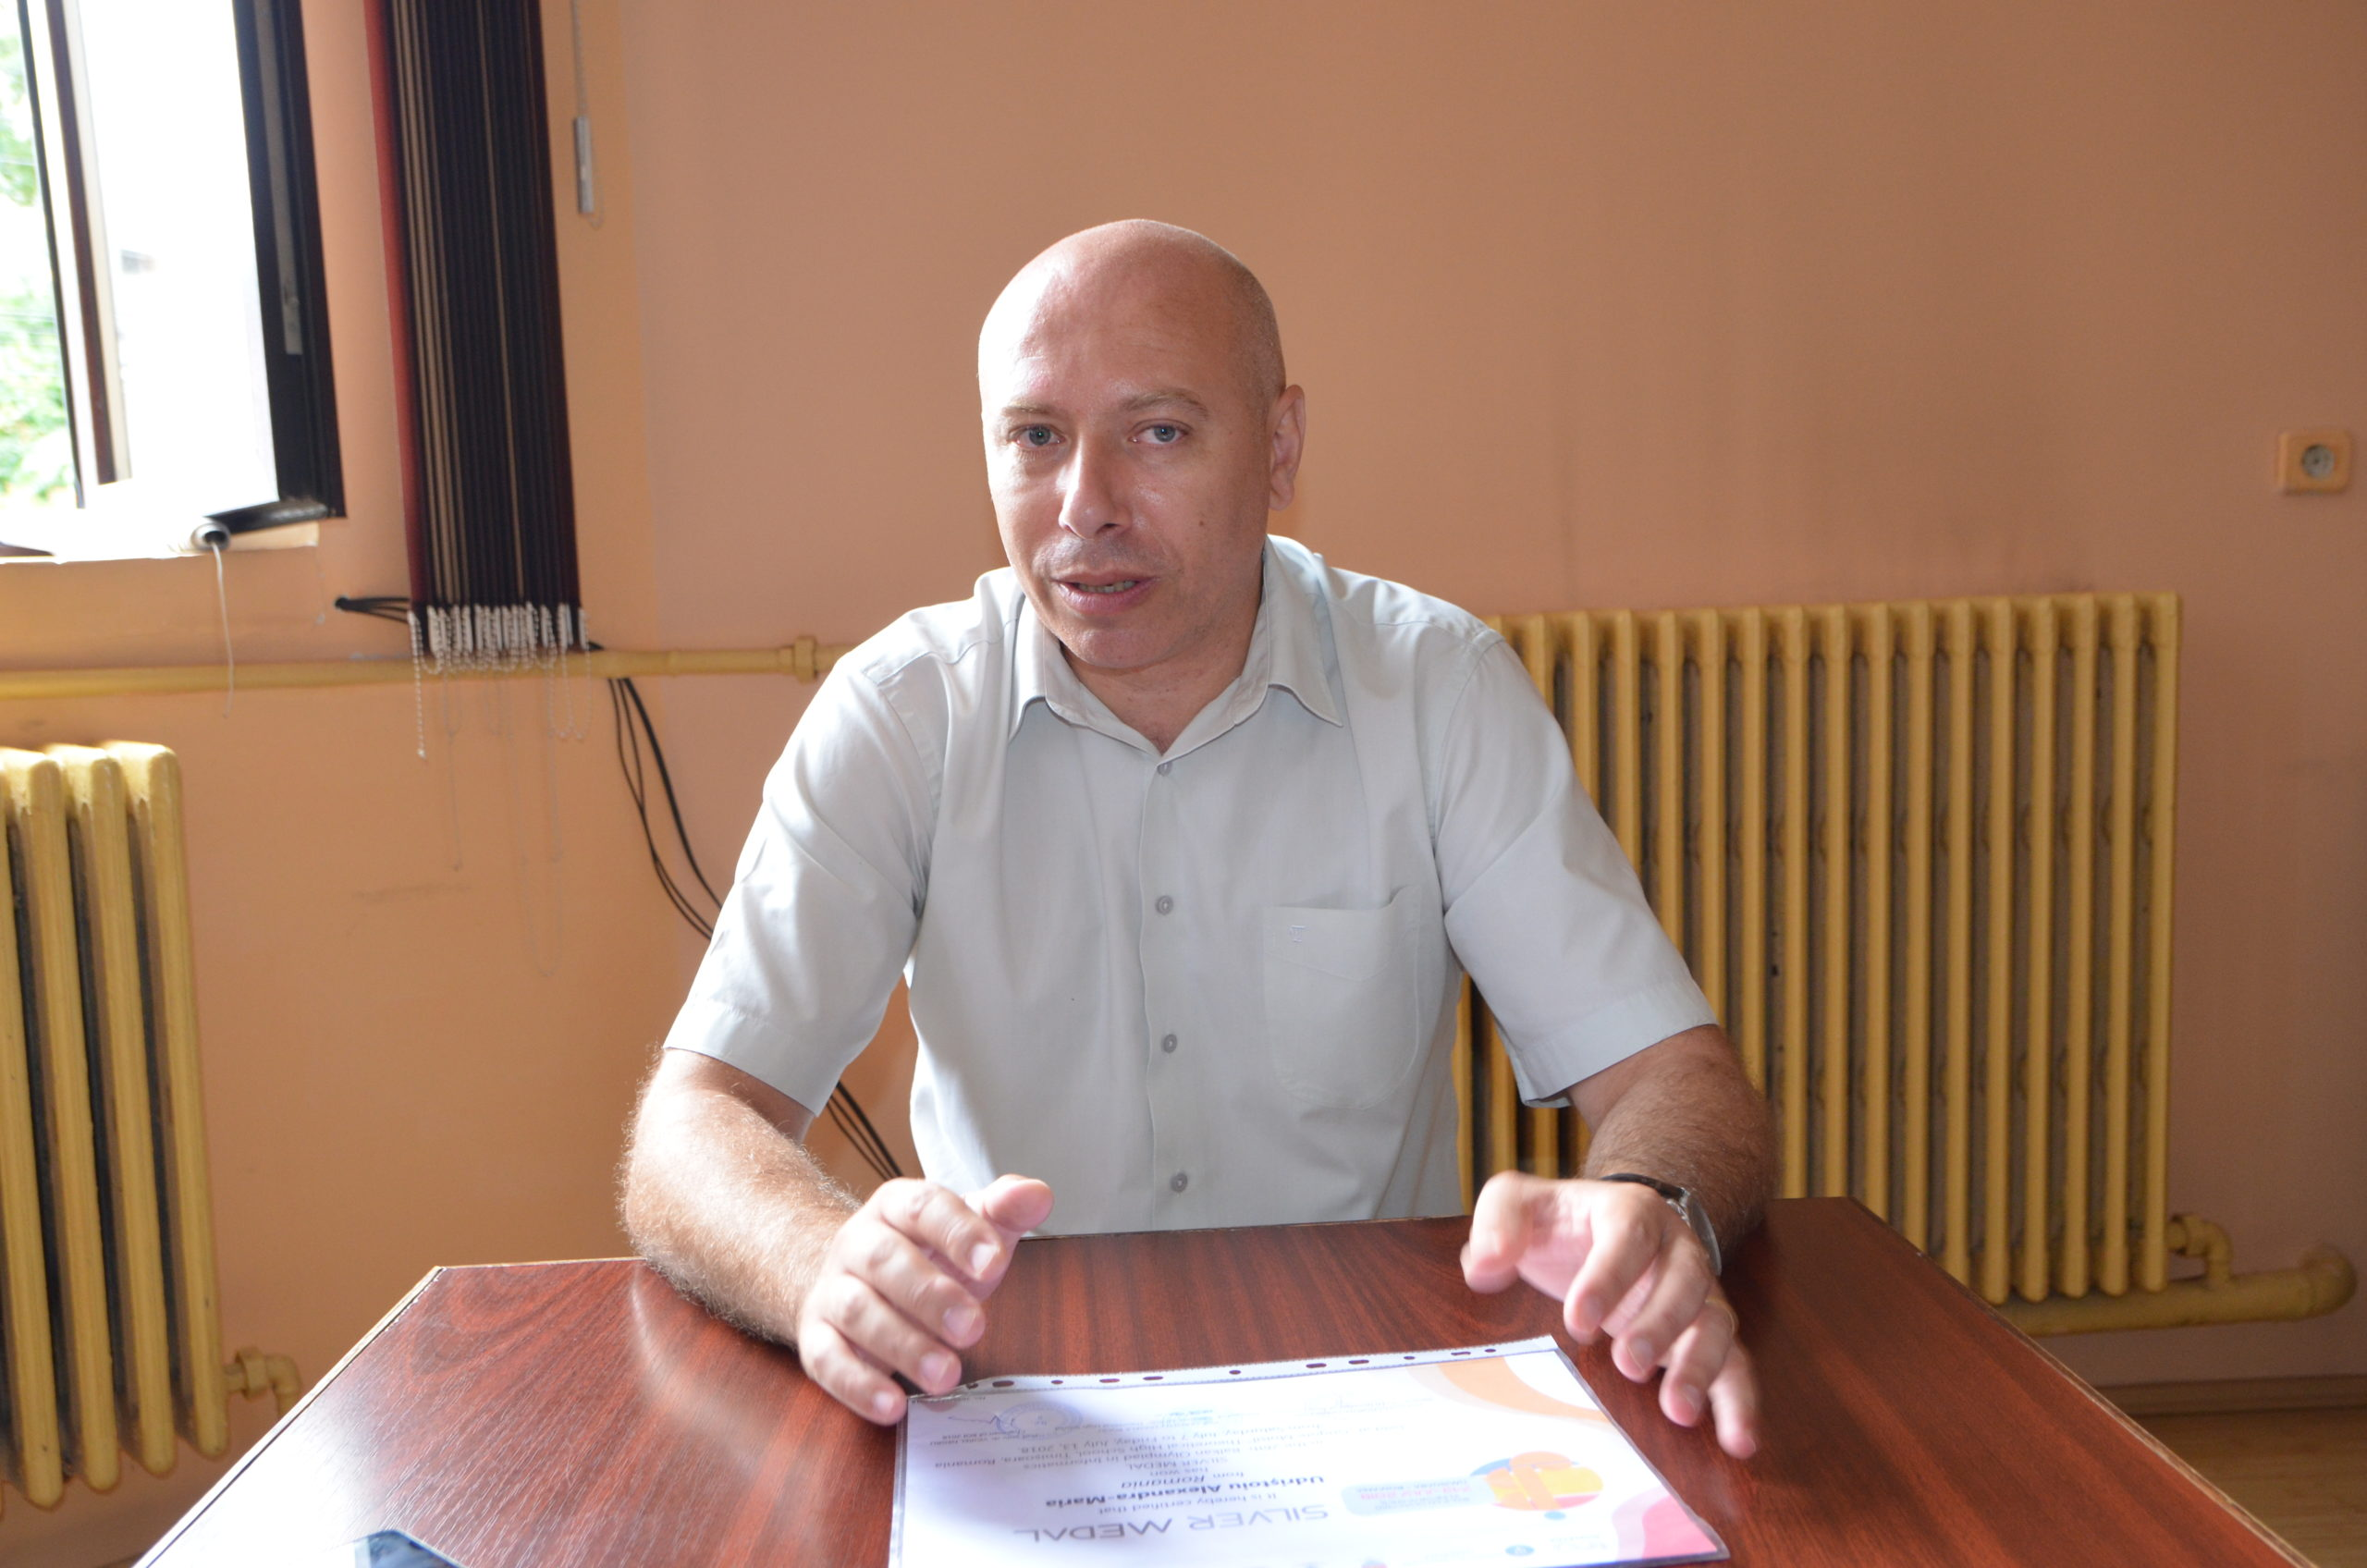 Elevii si profesorii sarbatoresc, joi, Ziua Educatiei, fara cursuri - Esential - controlappetit.ro